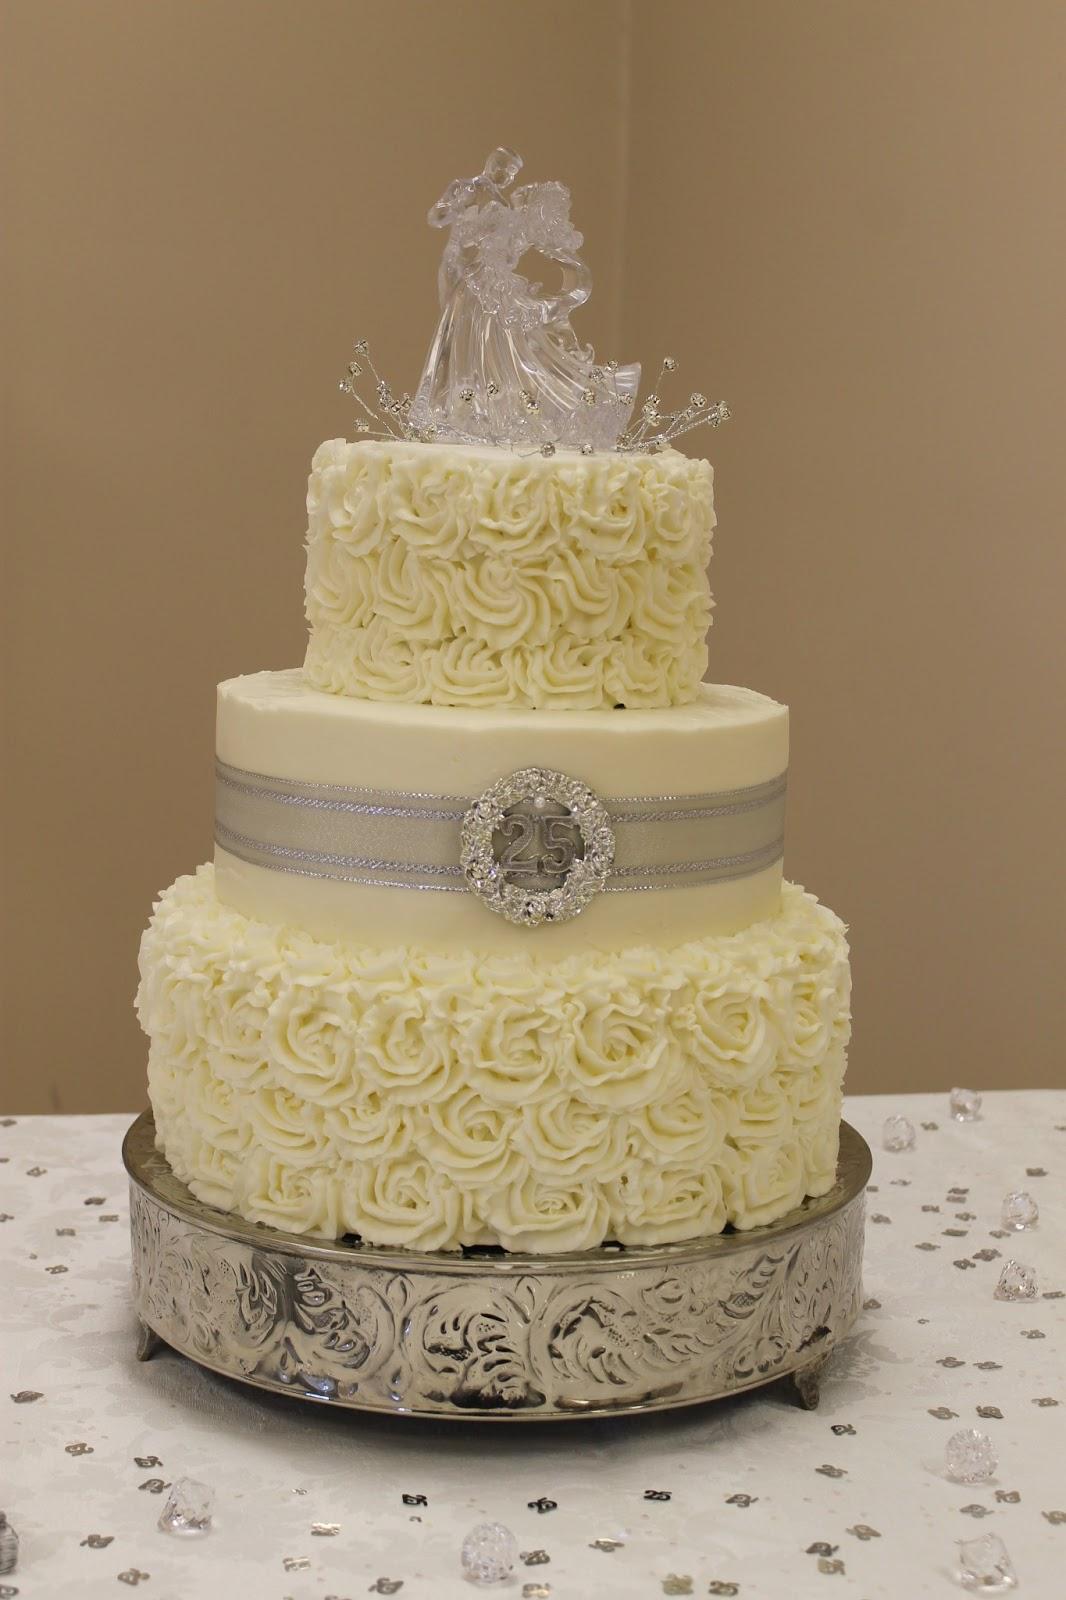 The Simple Cake: Silver Wedding Anniversary Cake